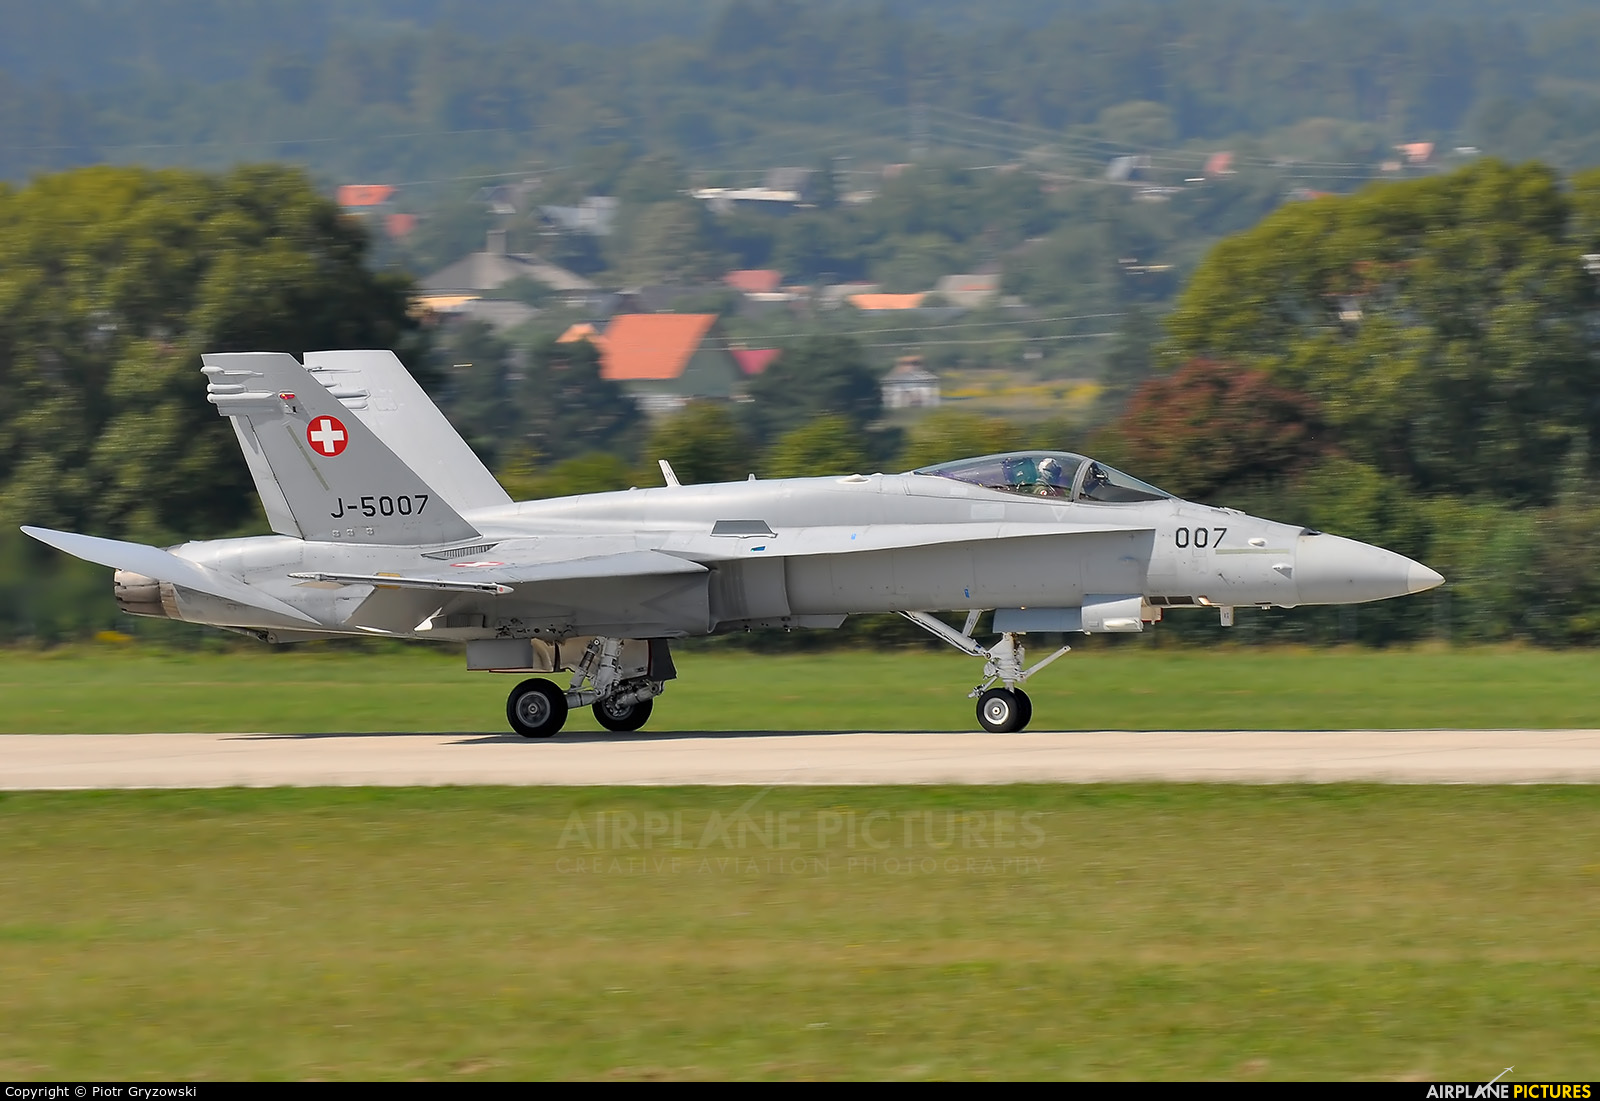 Switzerland - Air Force J-5007 aircraft at Sliač